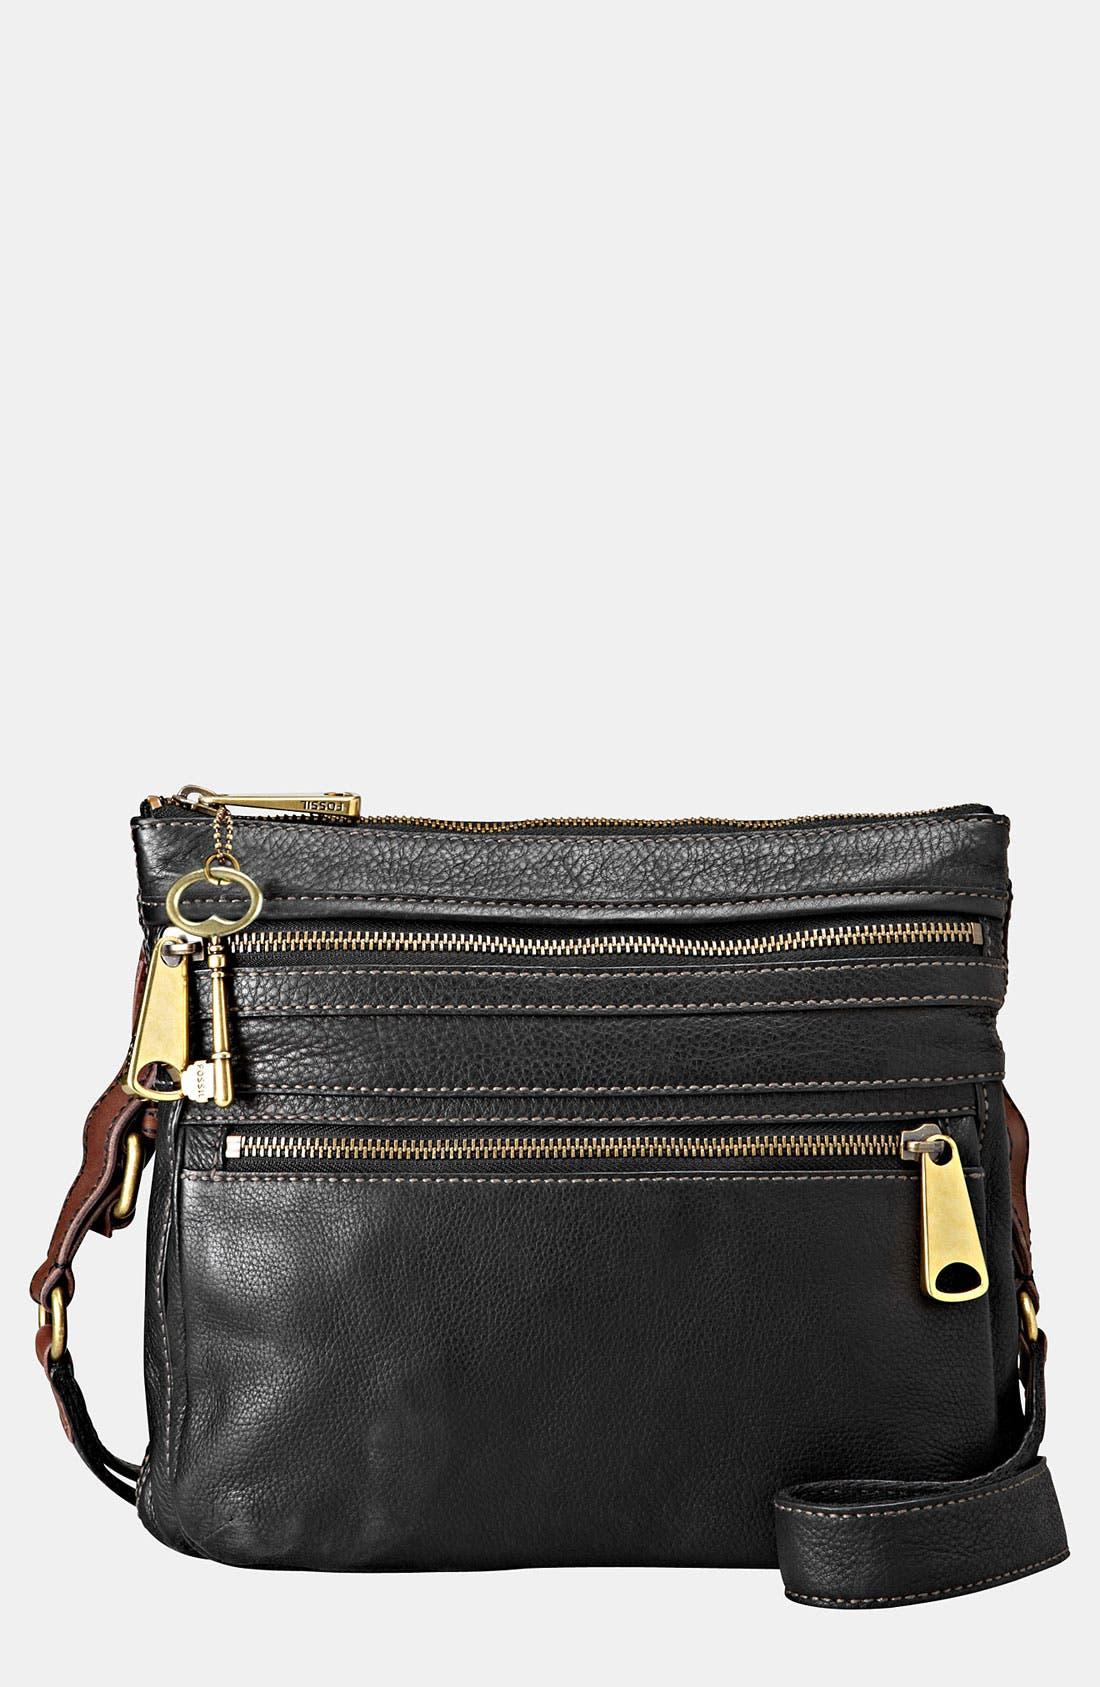 Main Image - Fossil 'Explorer' Crossbody Bag